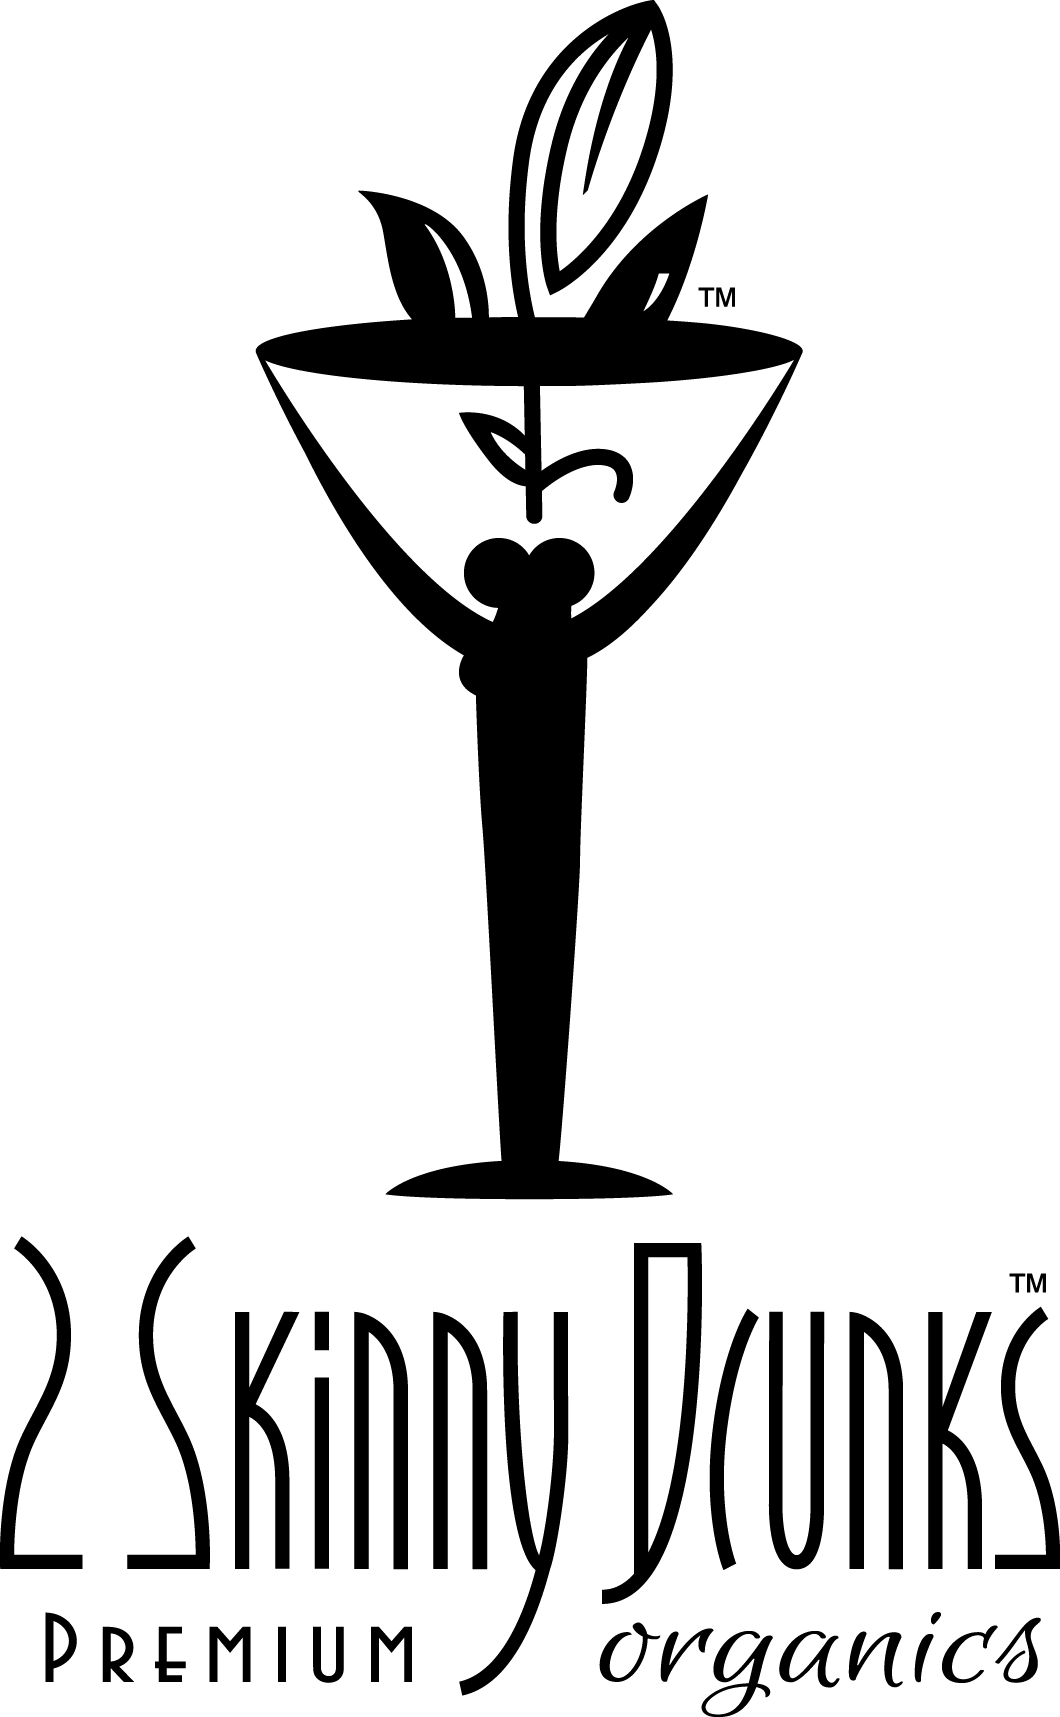 2 Skinny Drunks Premium Organics, North America's finest